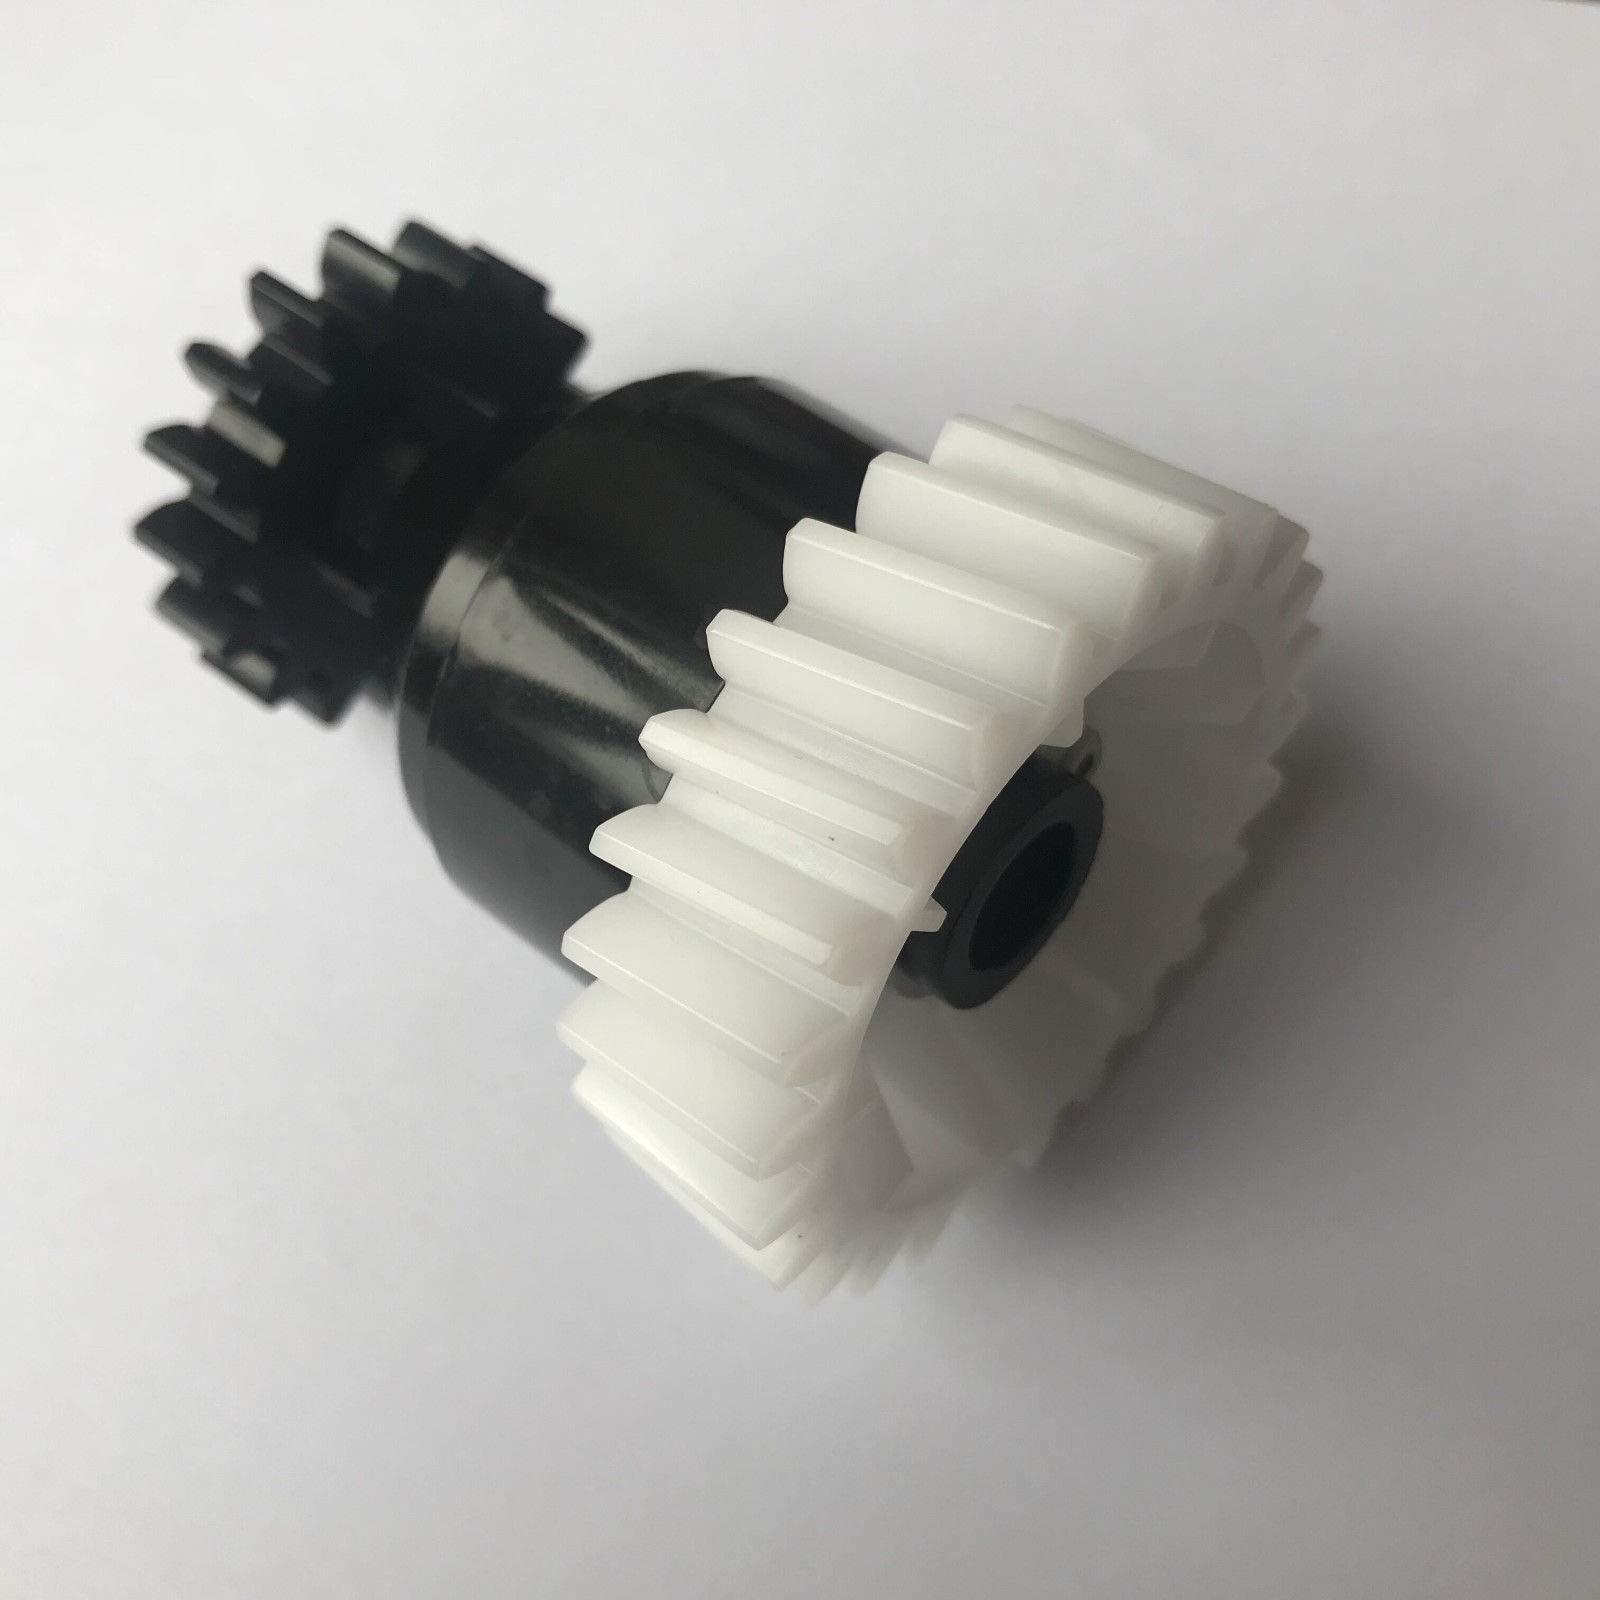 FidgetFidget A049051-01 Gear for QSS 26/29/30/32/33/34/35 Noritsu minilab